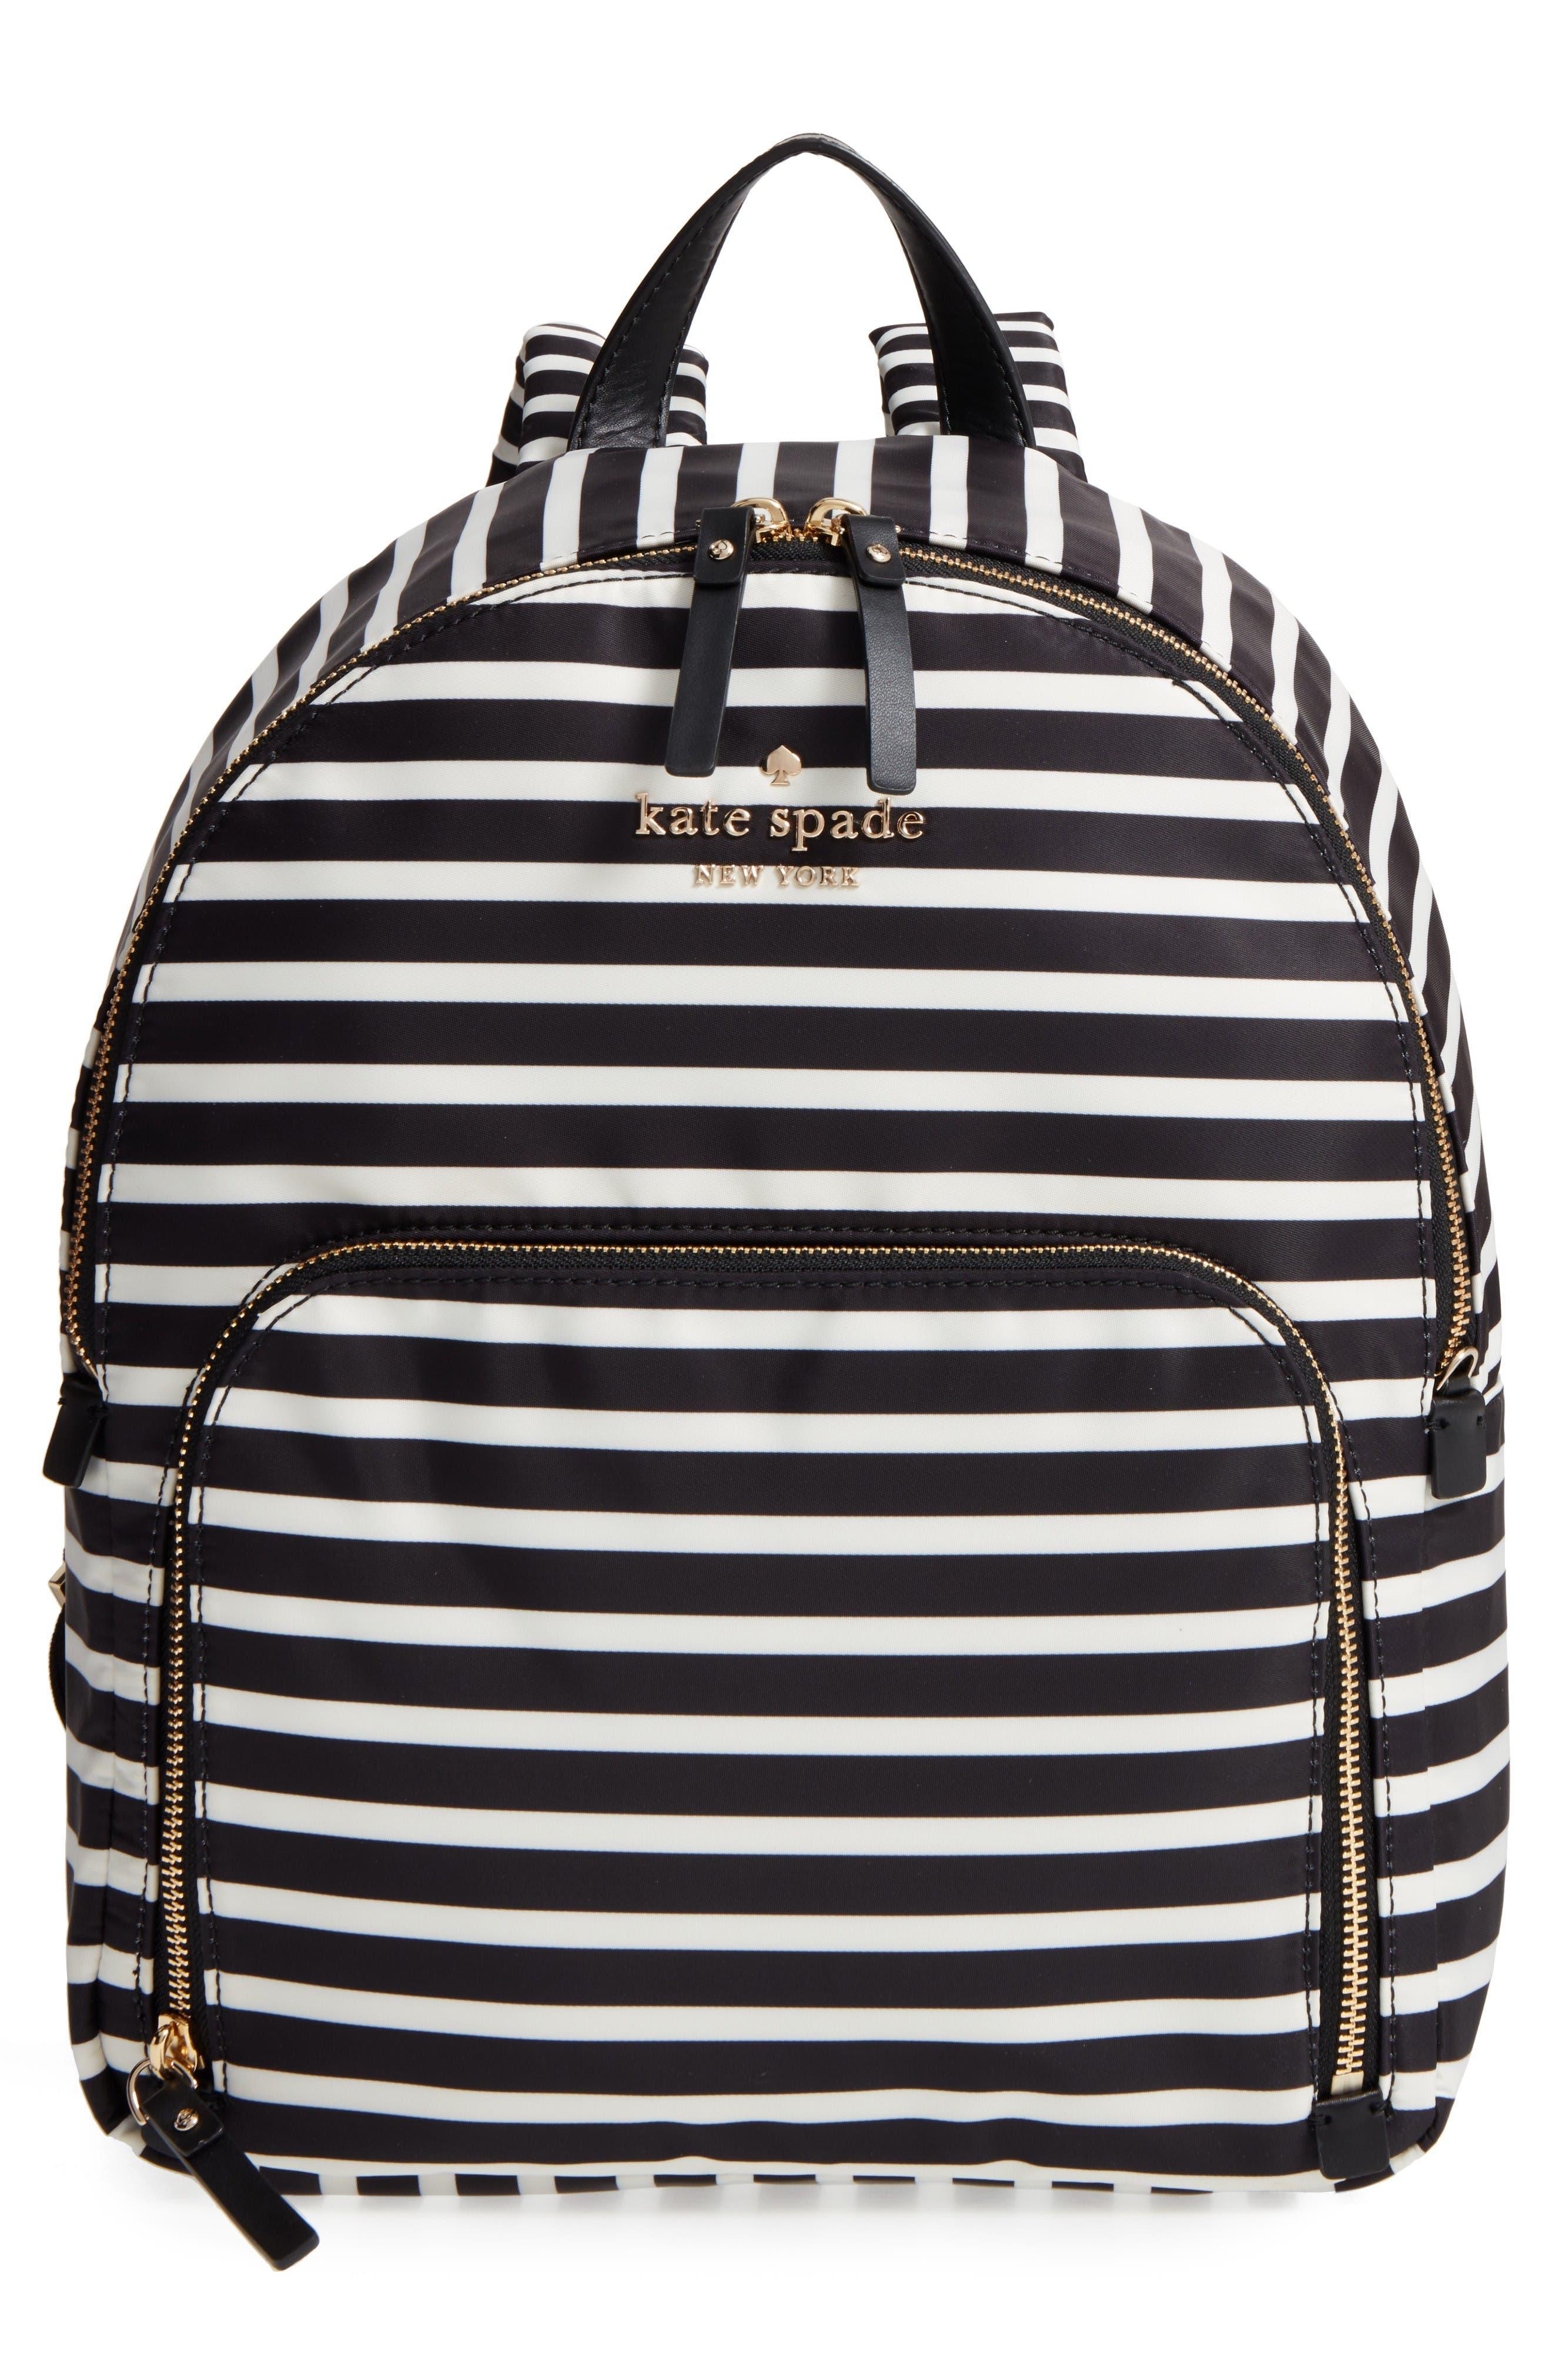 KATE SPADE NEW YORK watson lane - hartley nylon backpack